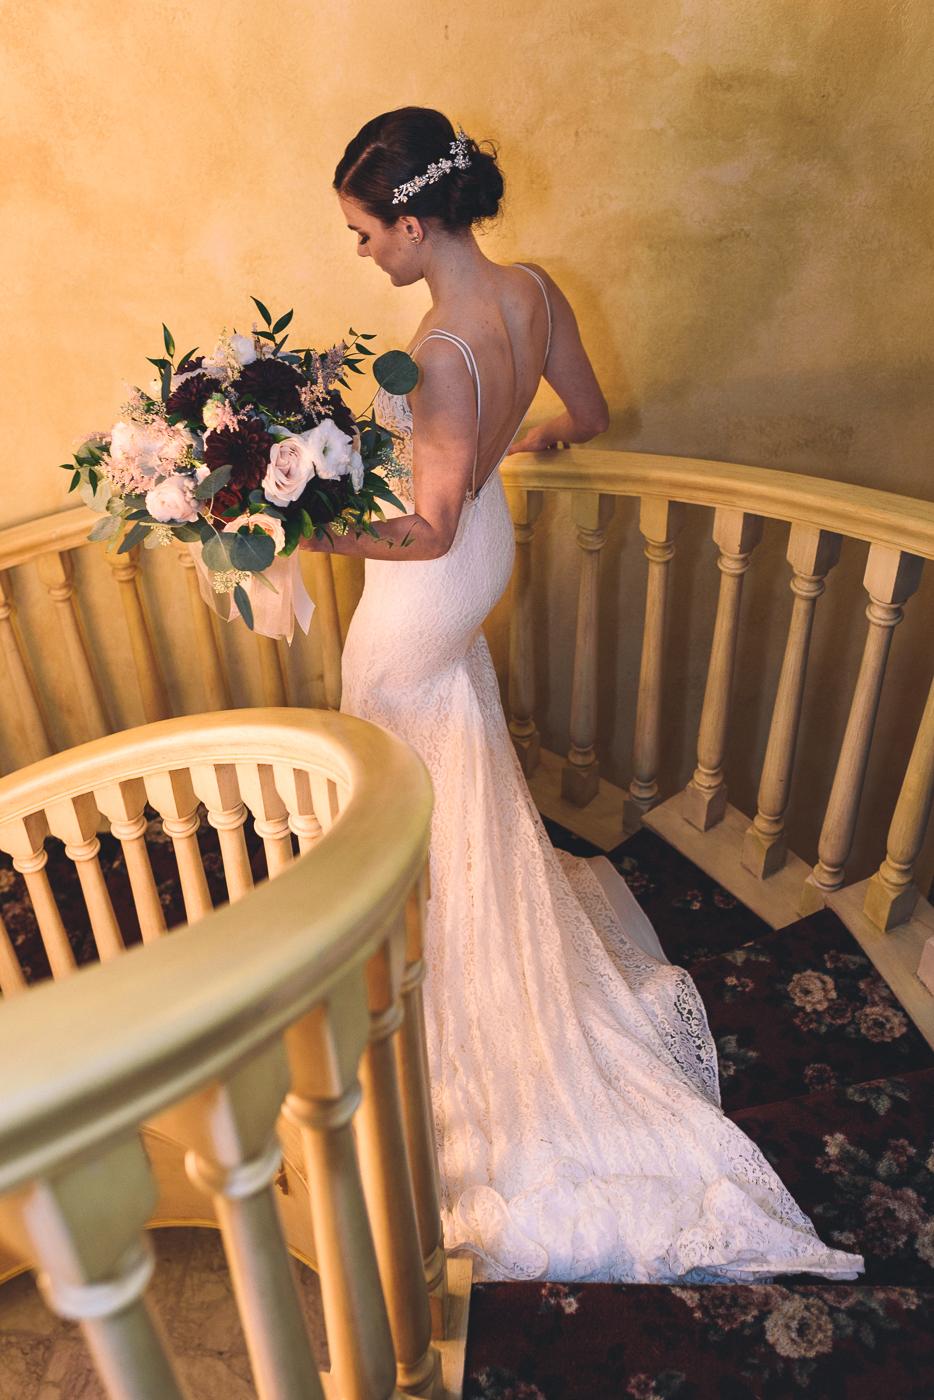 Elegant bride descending spiral staircase with bouquet